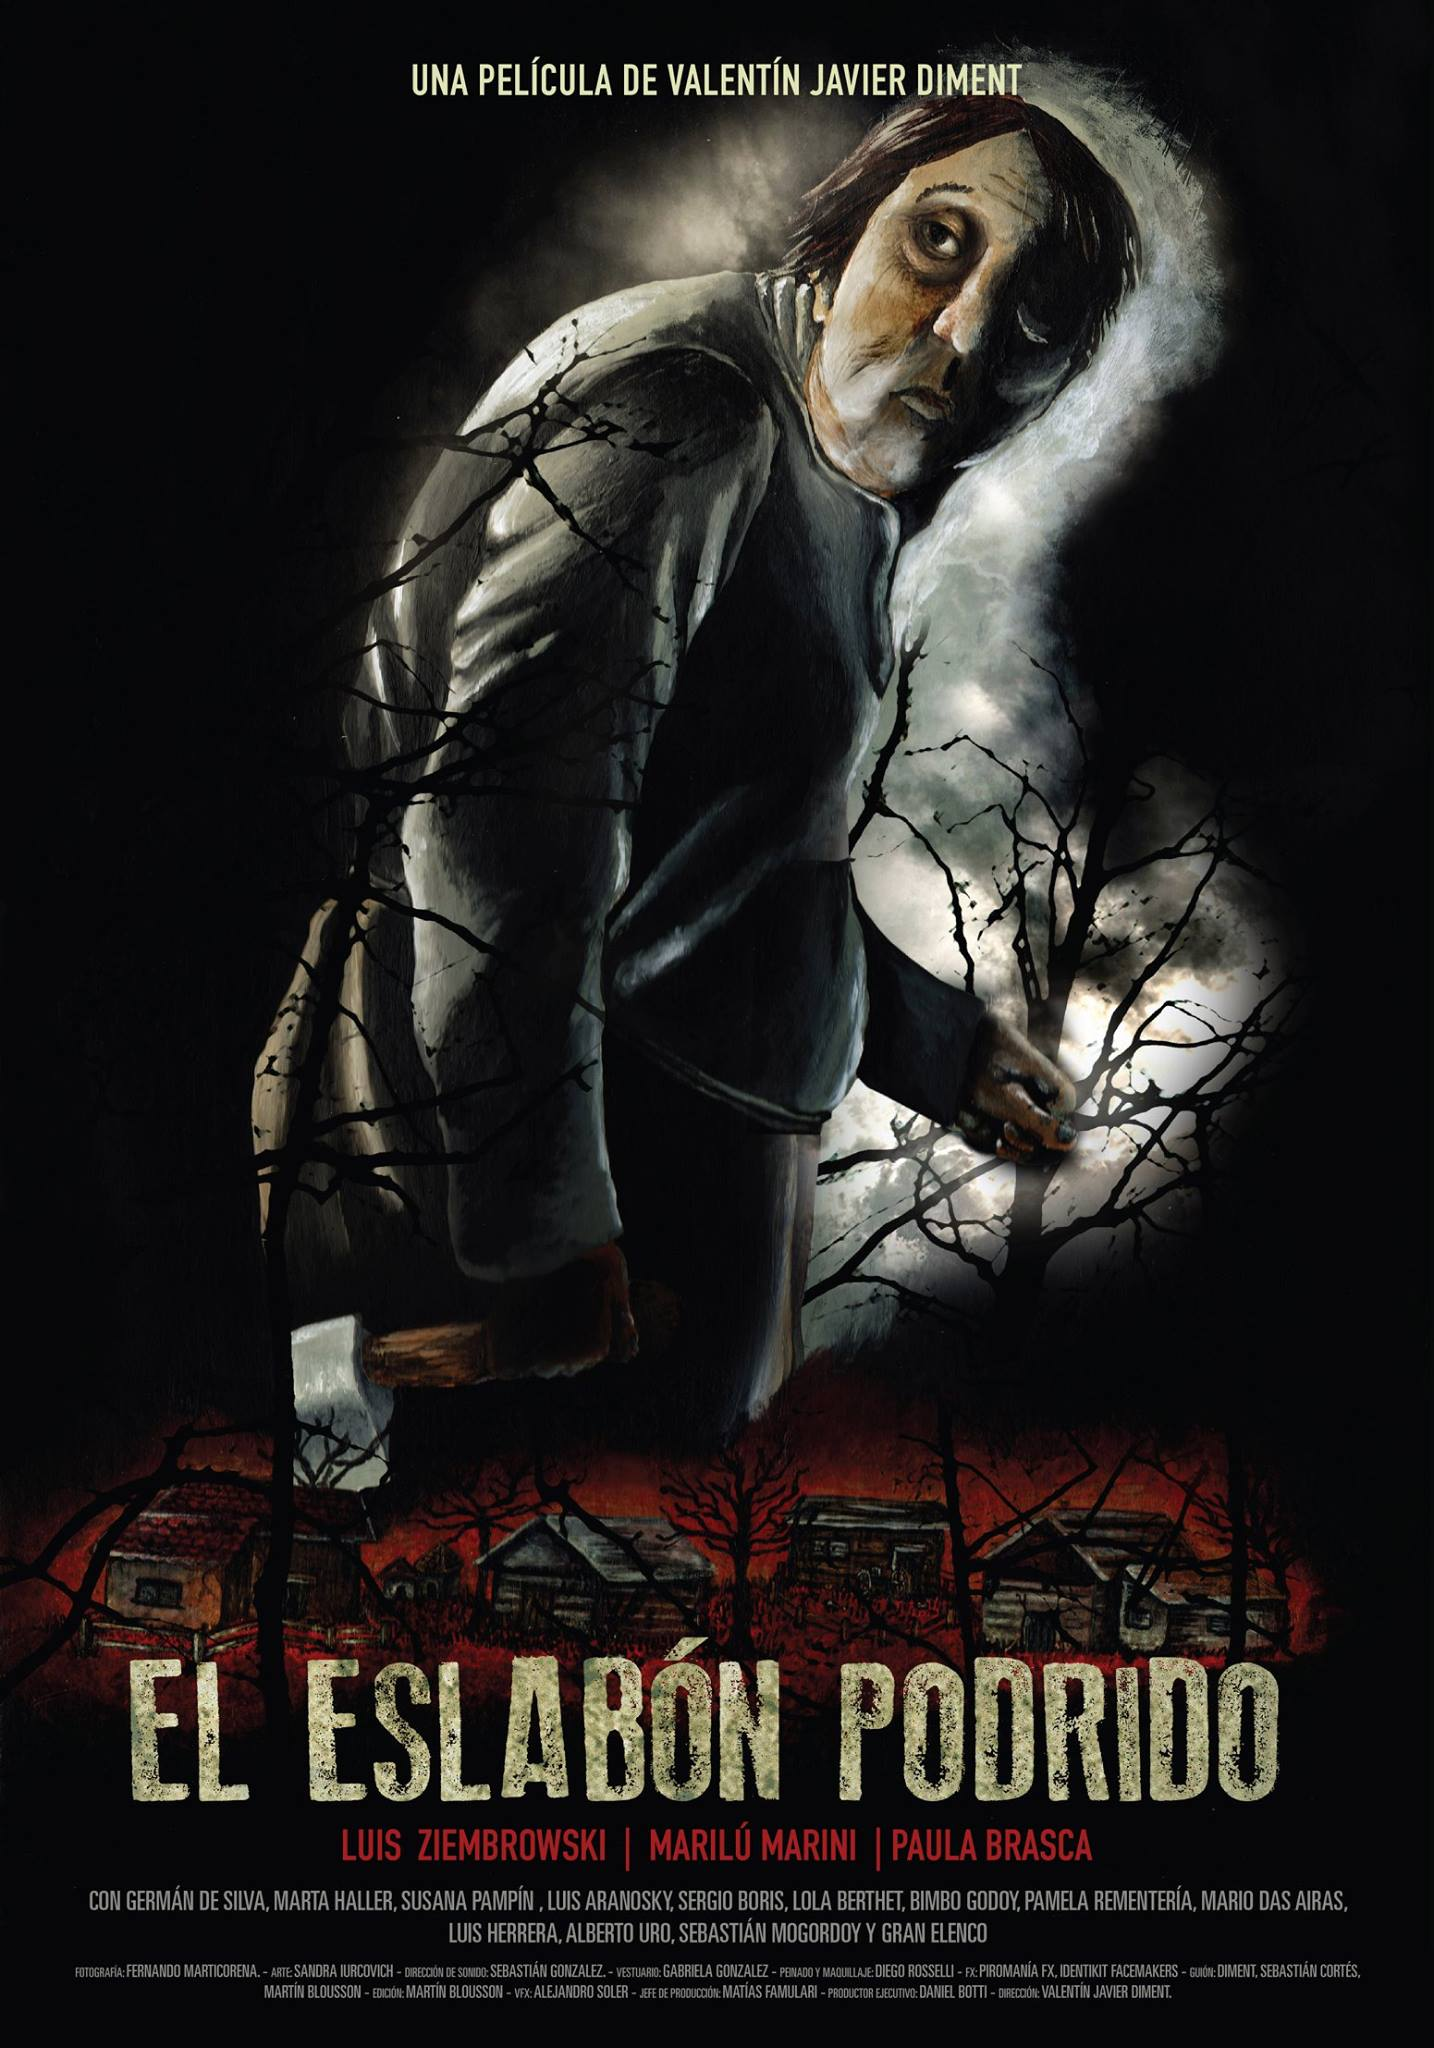 El eslabón podrido (2015) - IMDb